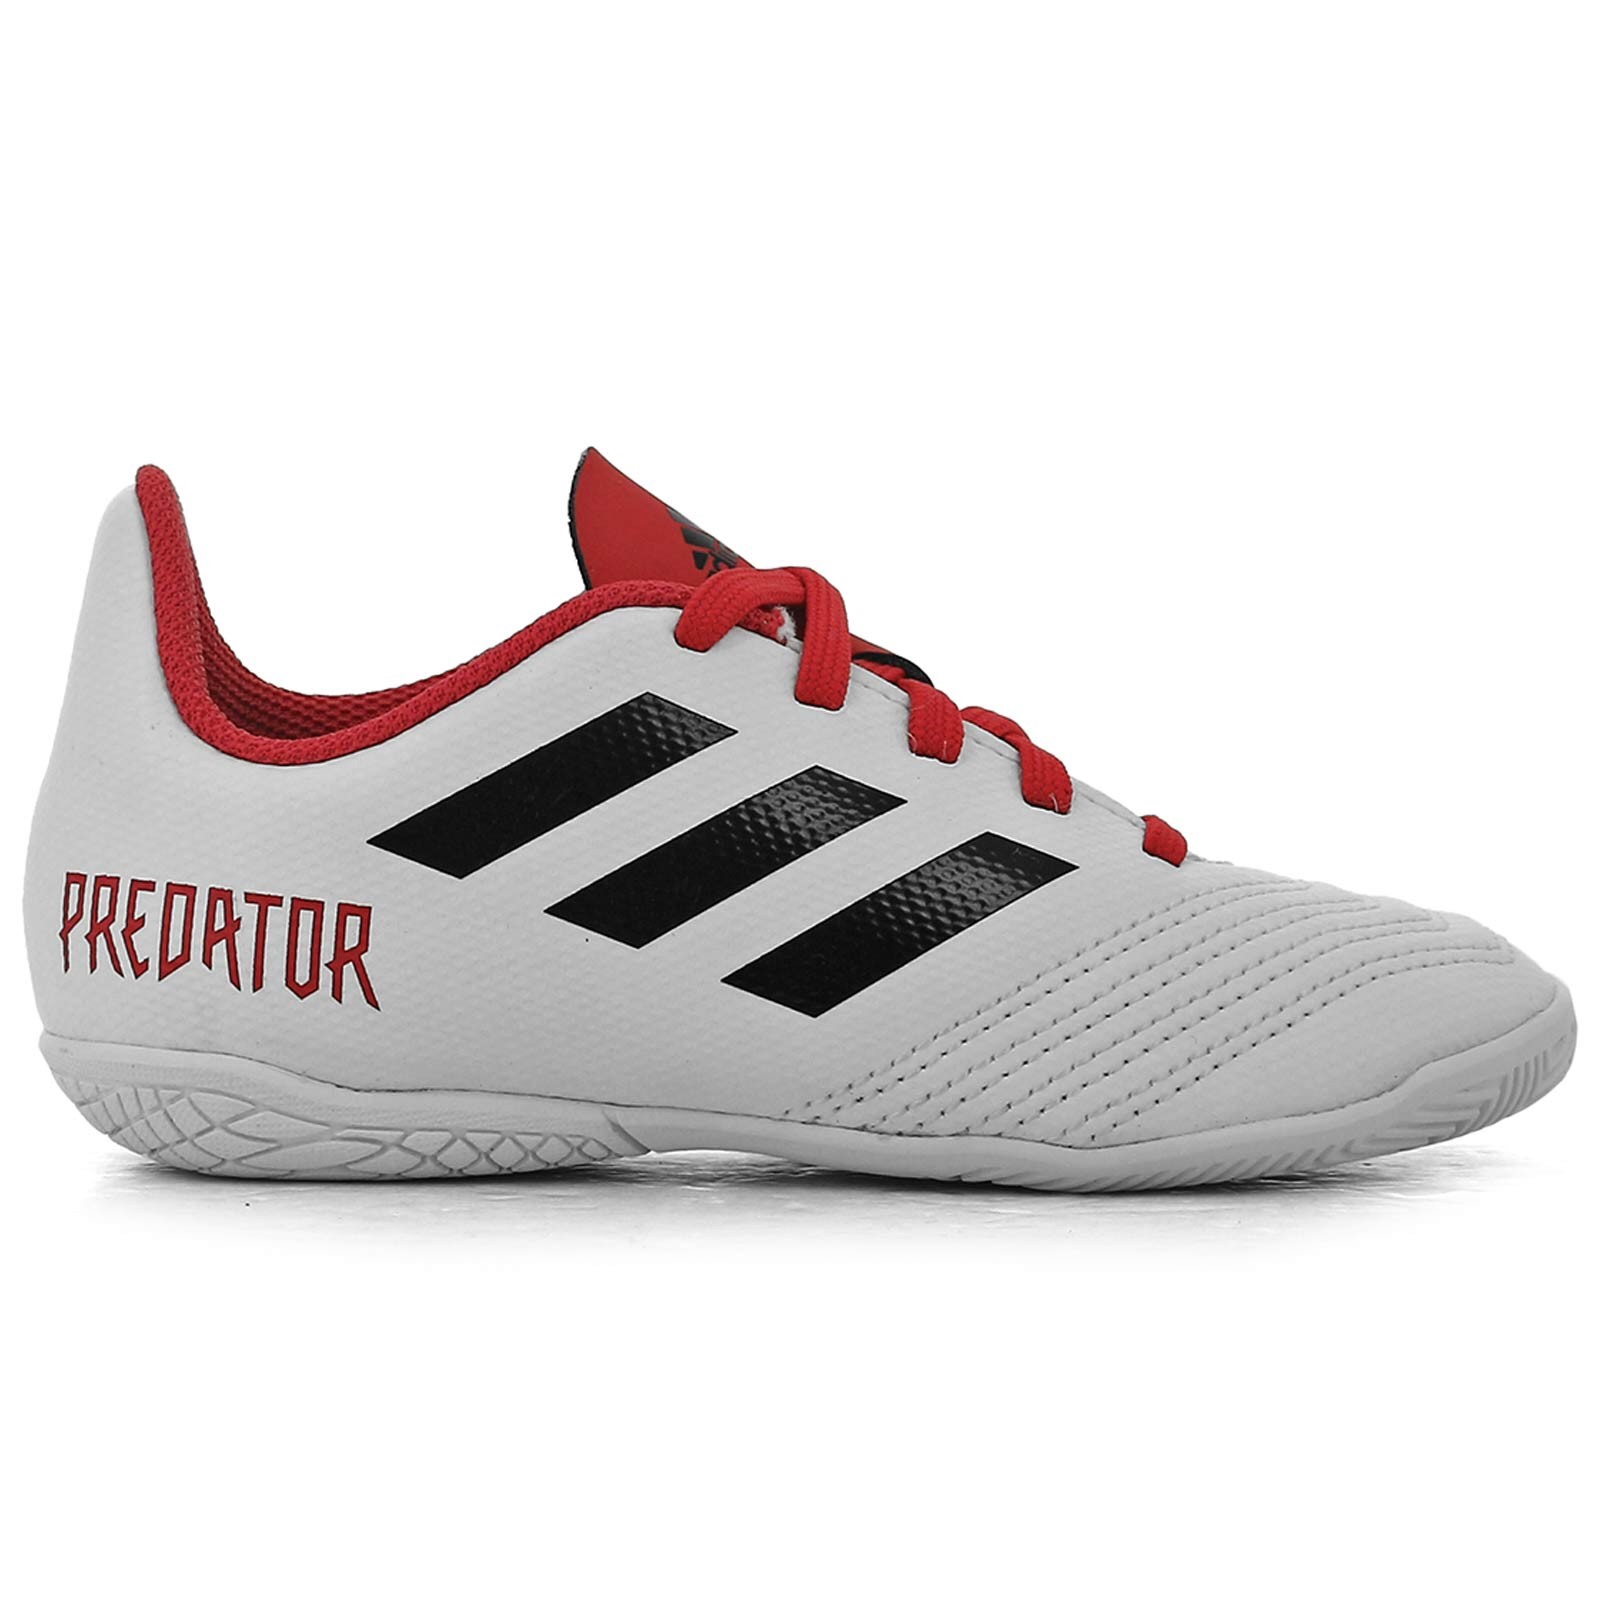 5d08c43bbd2d Adidas Predator Tango 18.4 TF Junior (White Red Black) - The Football  Factory